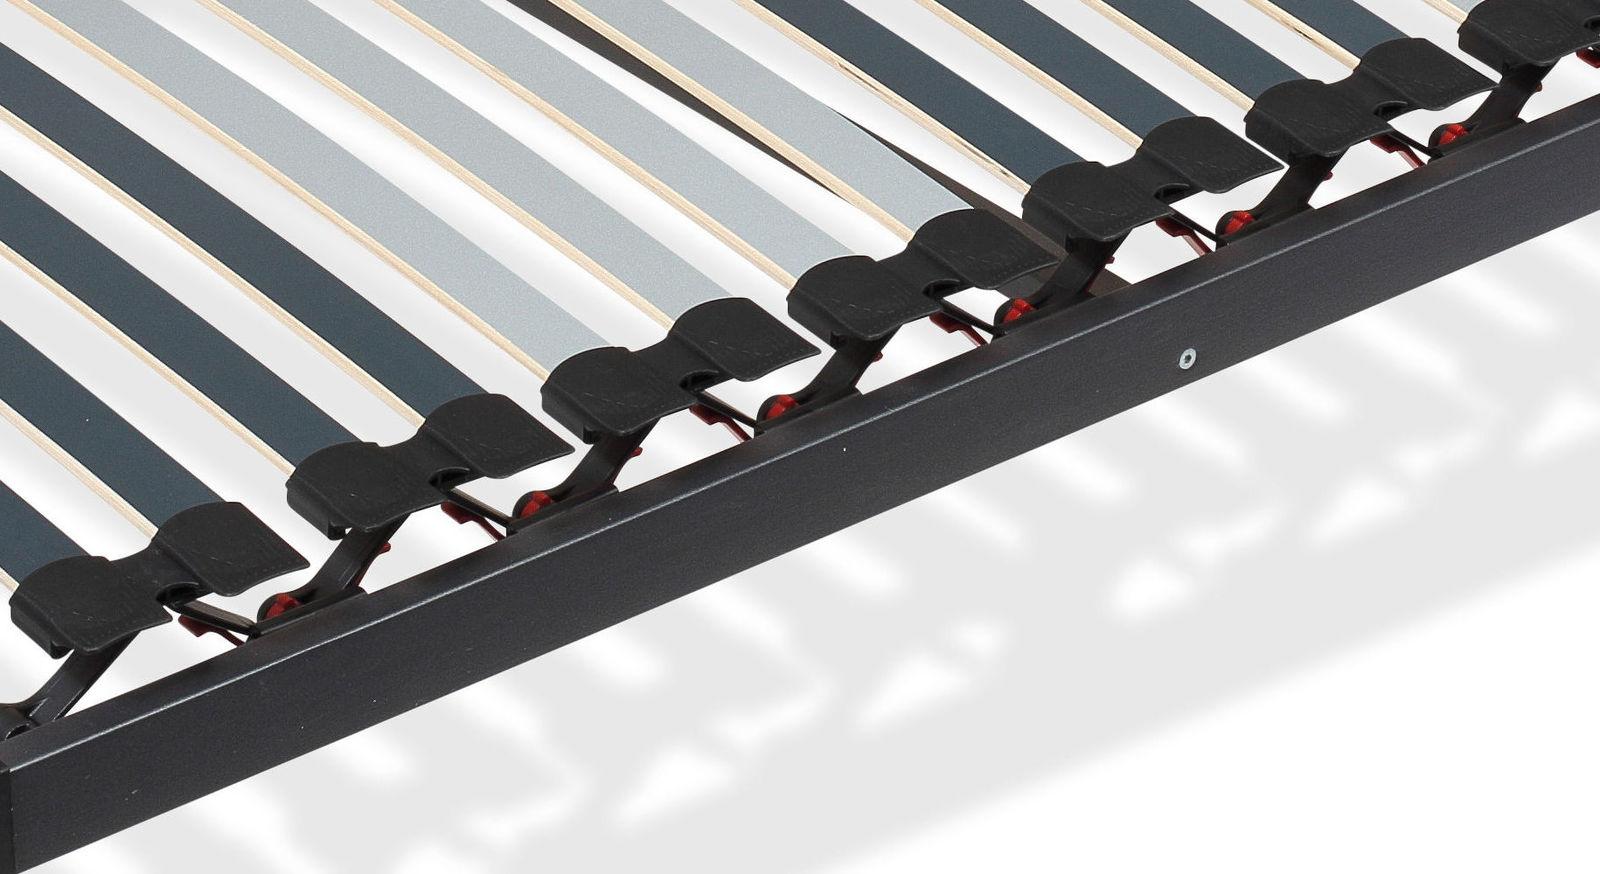 Stabiler Lattenrost Balance Sleep bis 120 kg belastbar